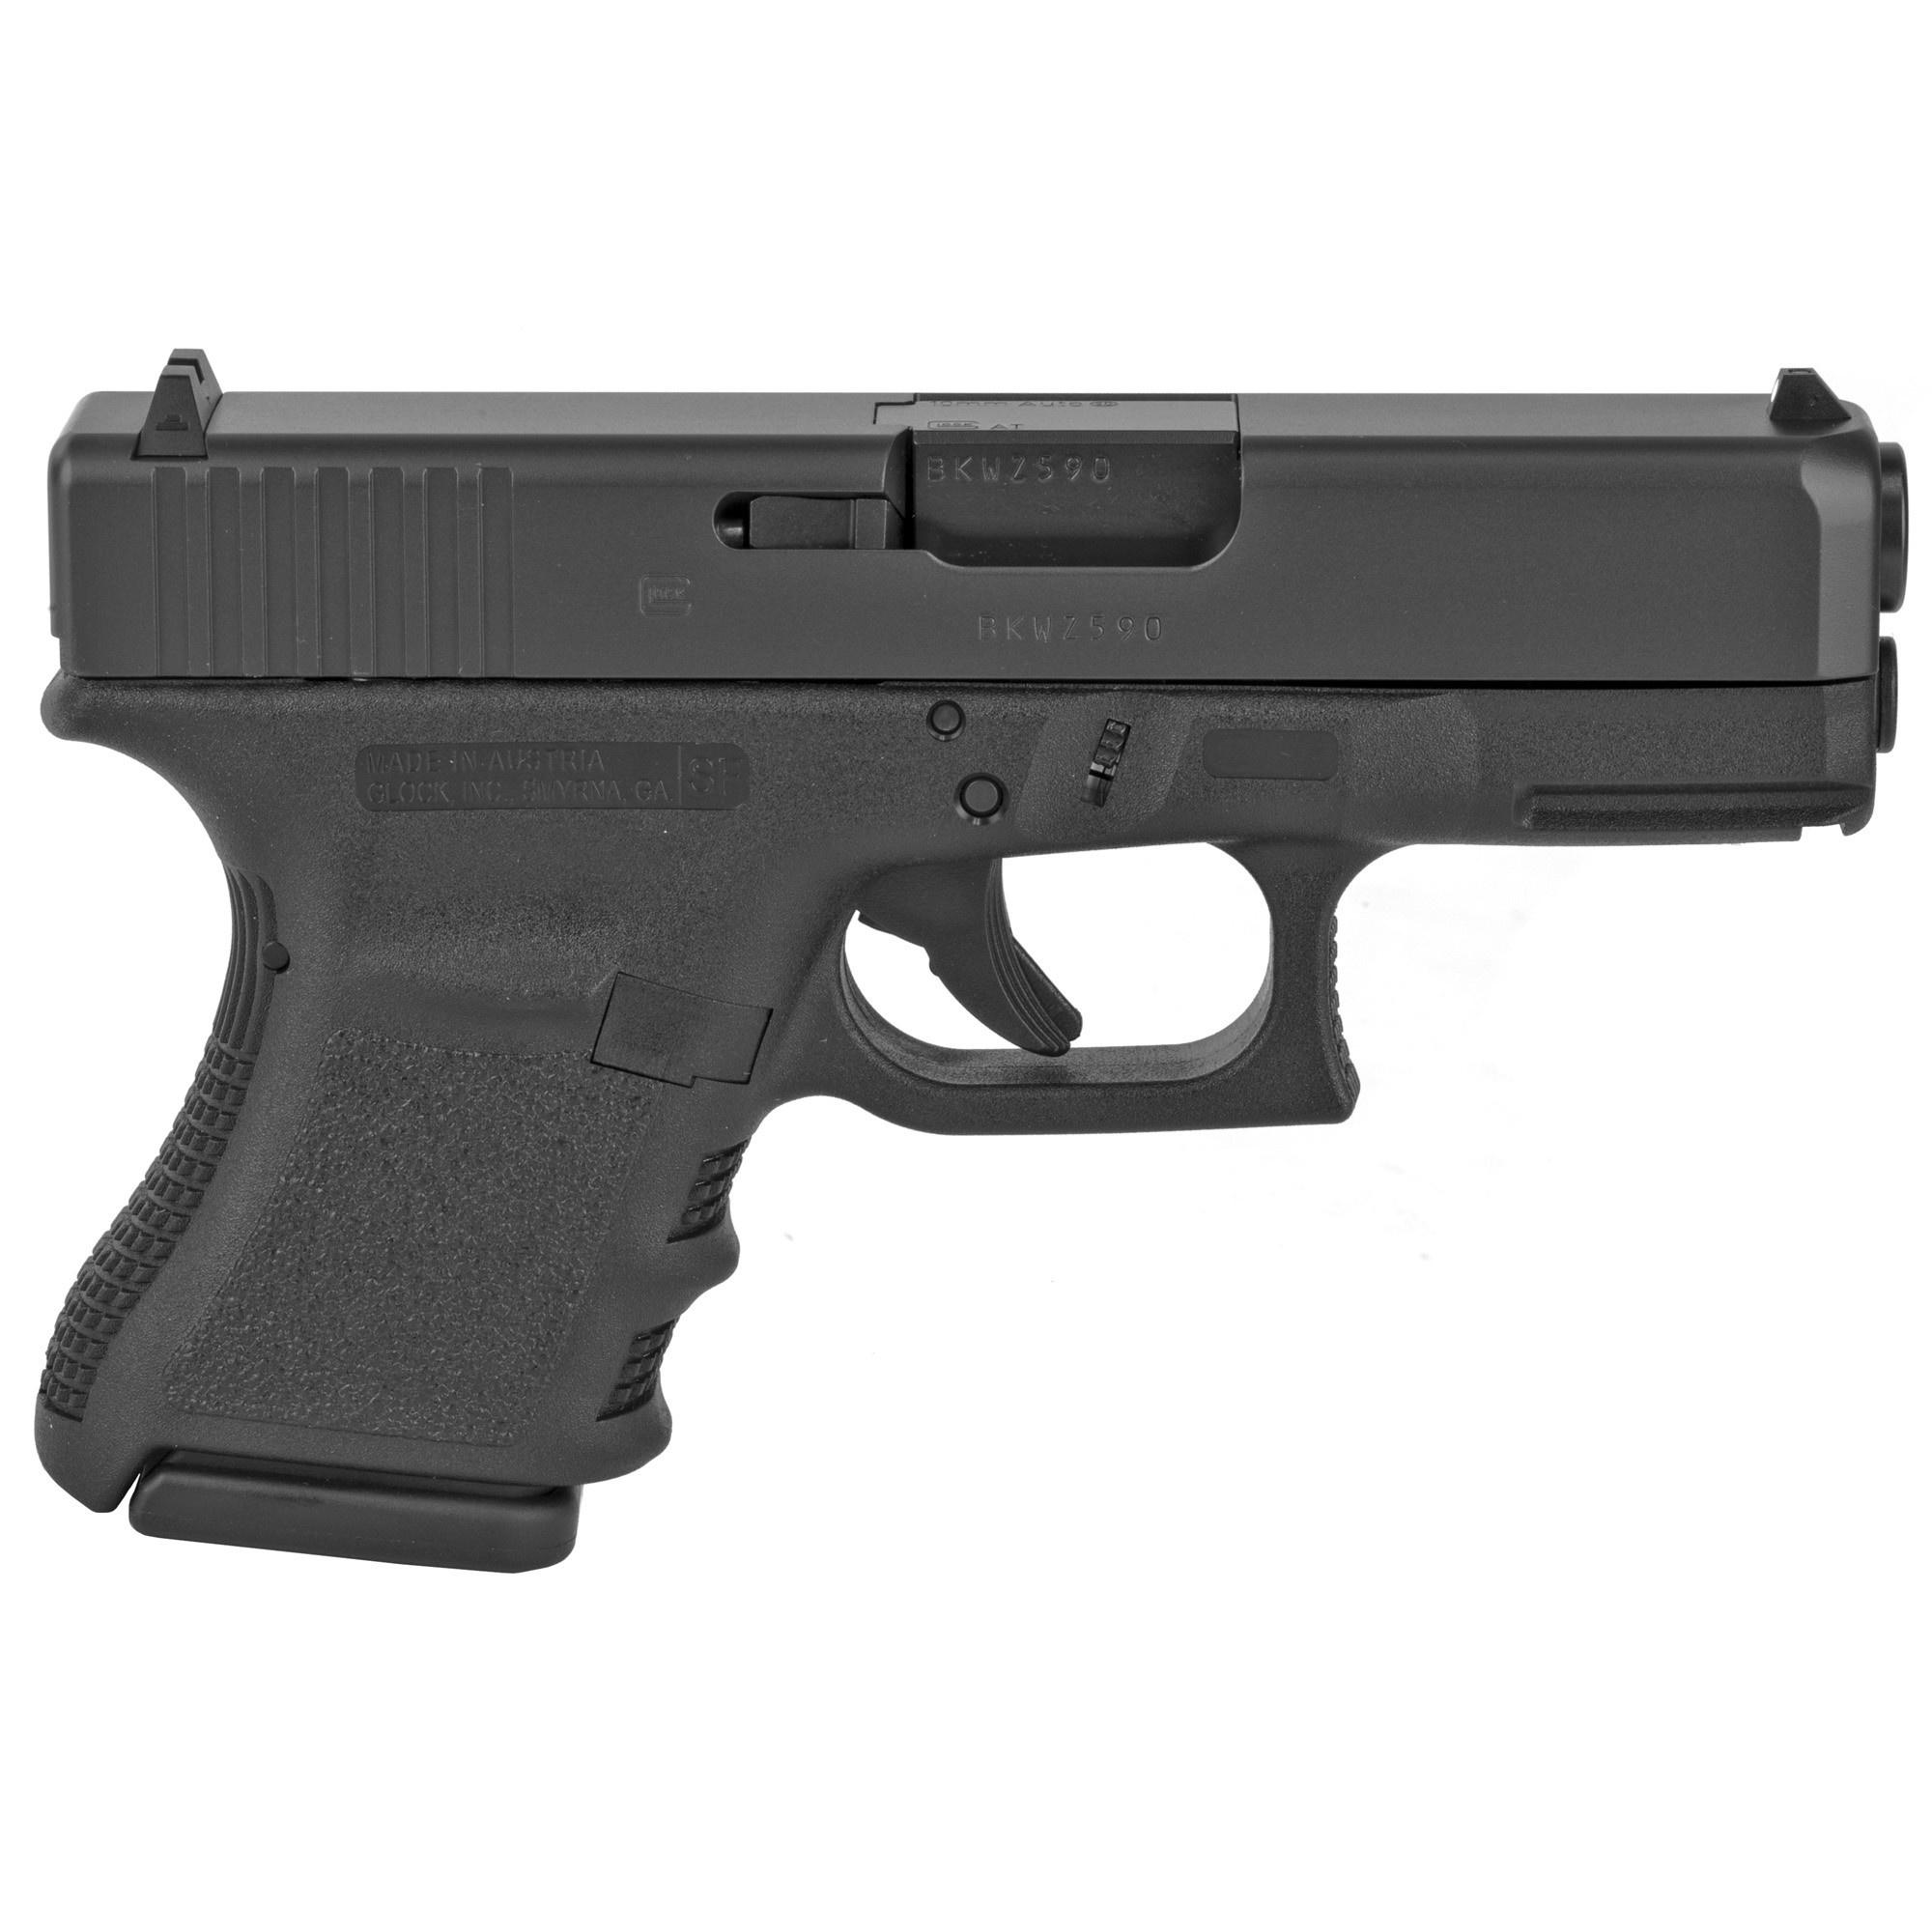 Glock G29SF Pistol 10mm